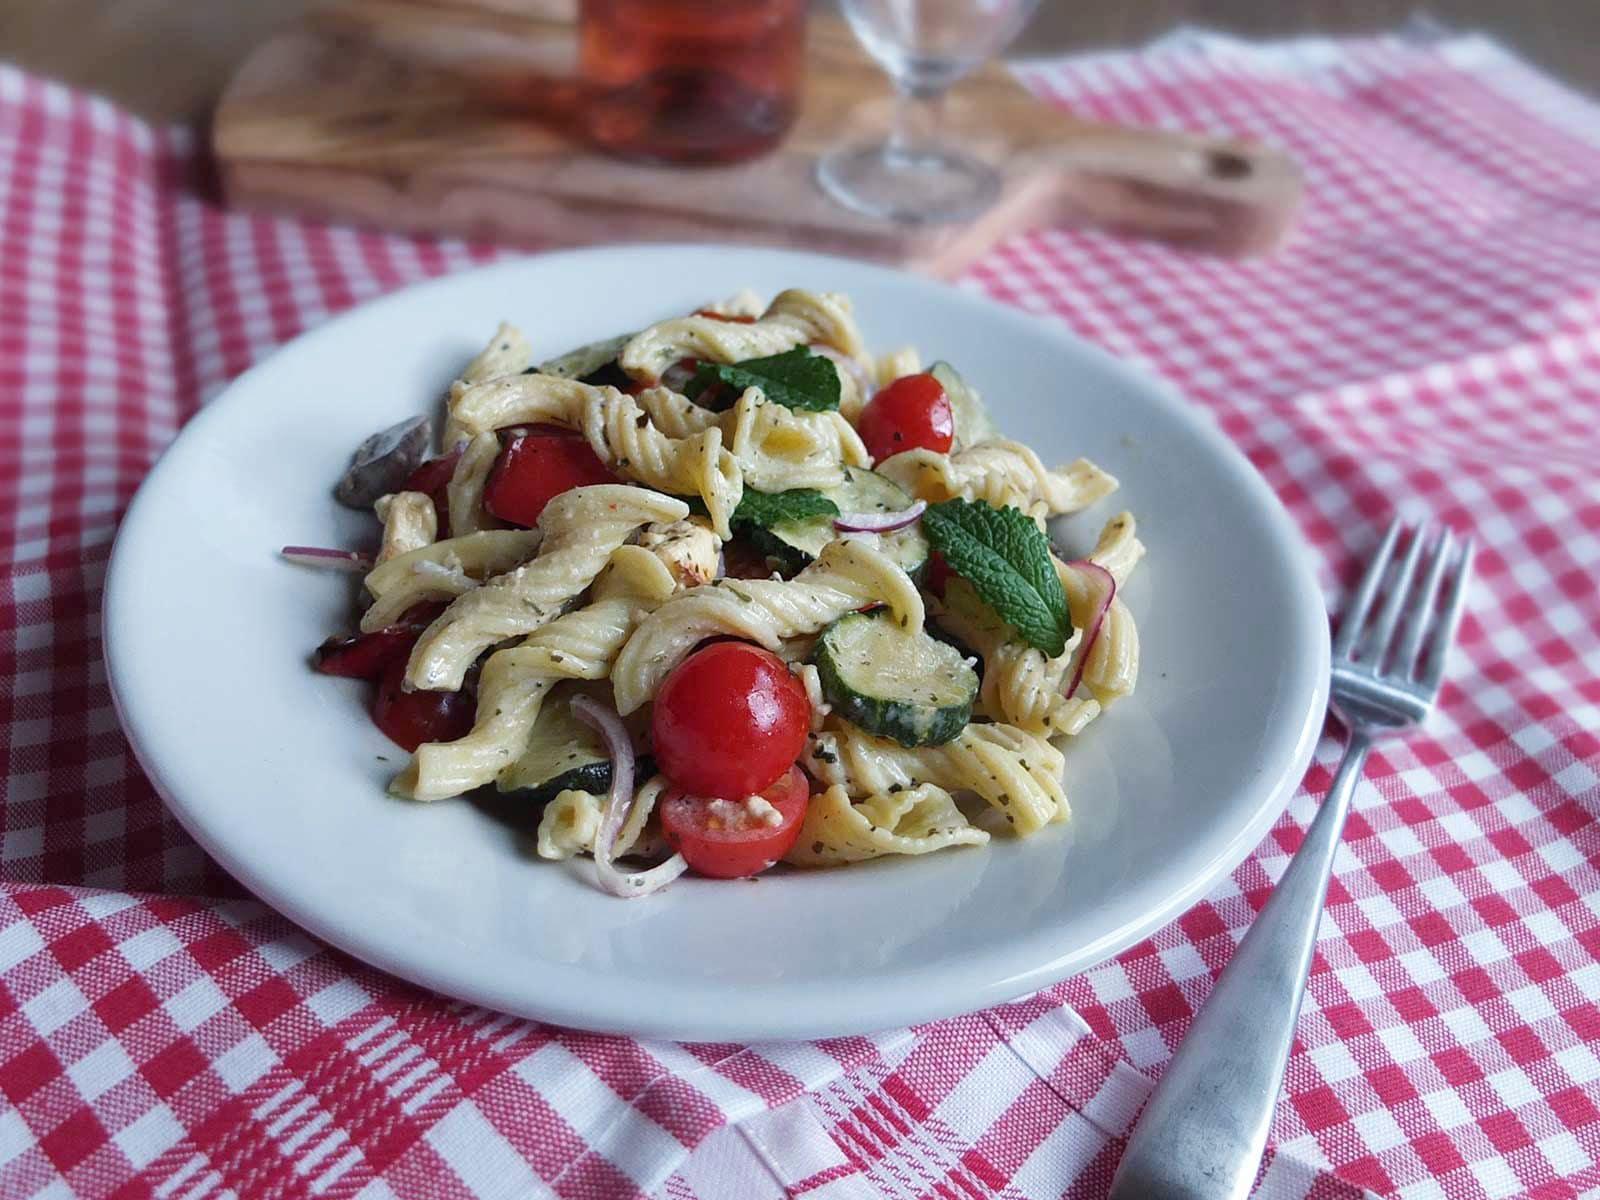 nudelsalat mit ofengemüse leibundseele pasta aus westfalen